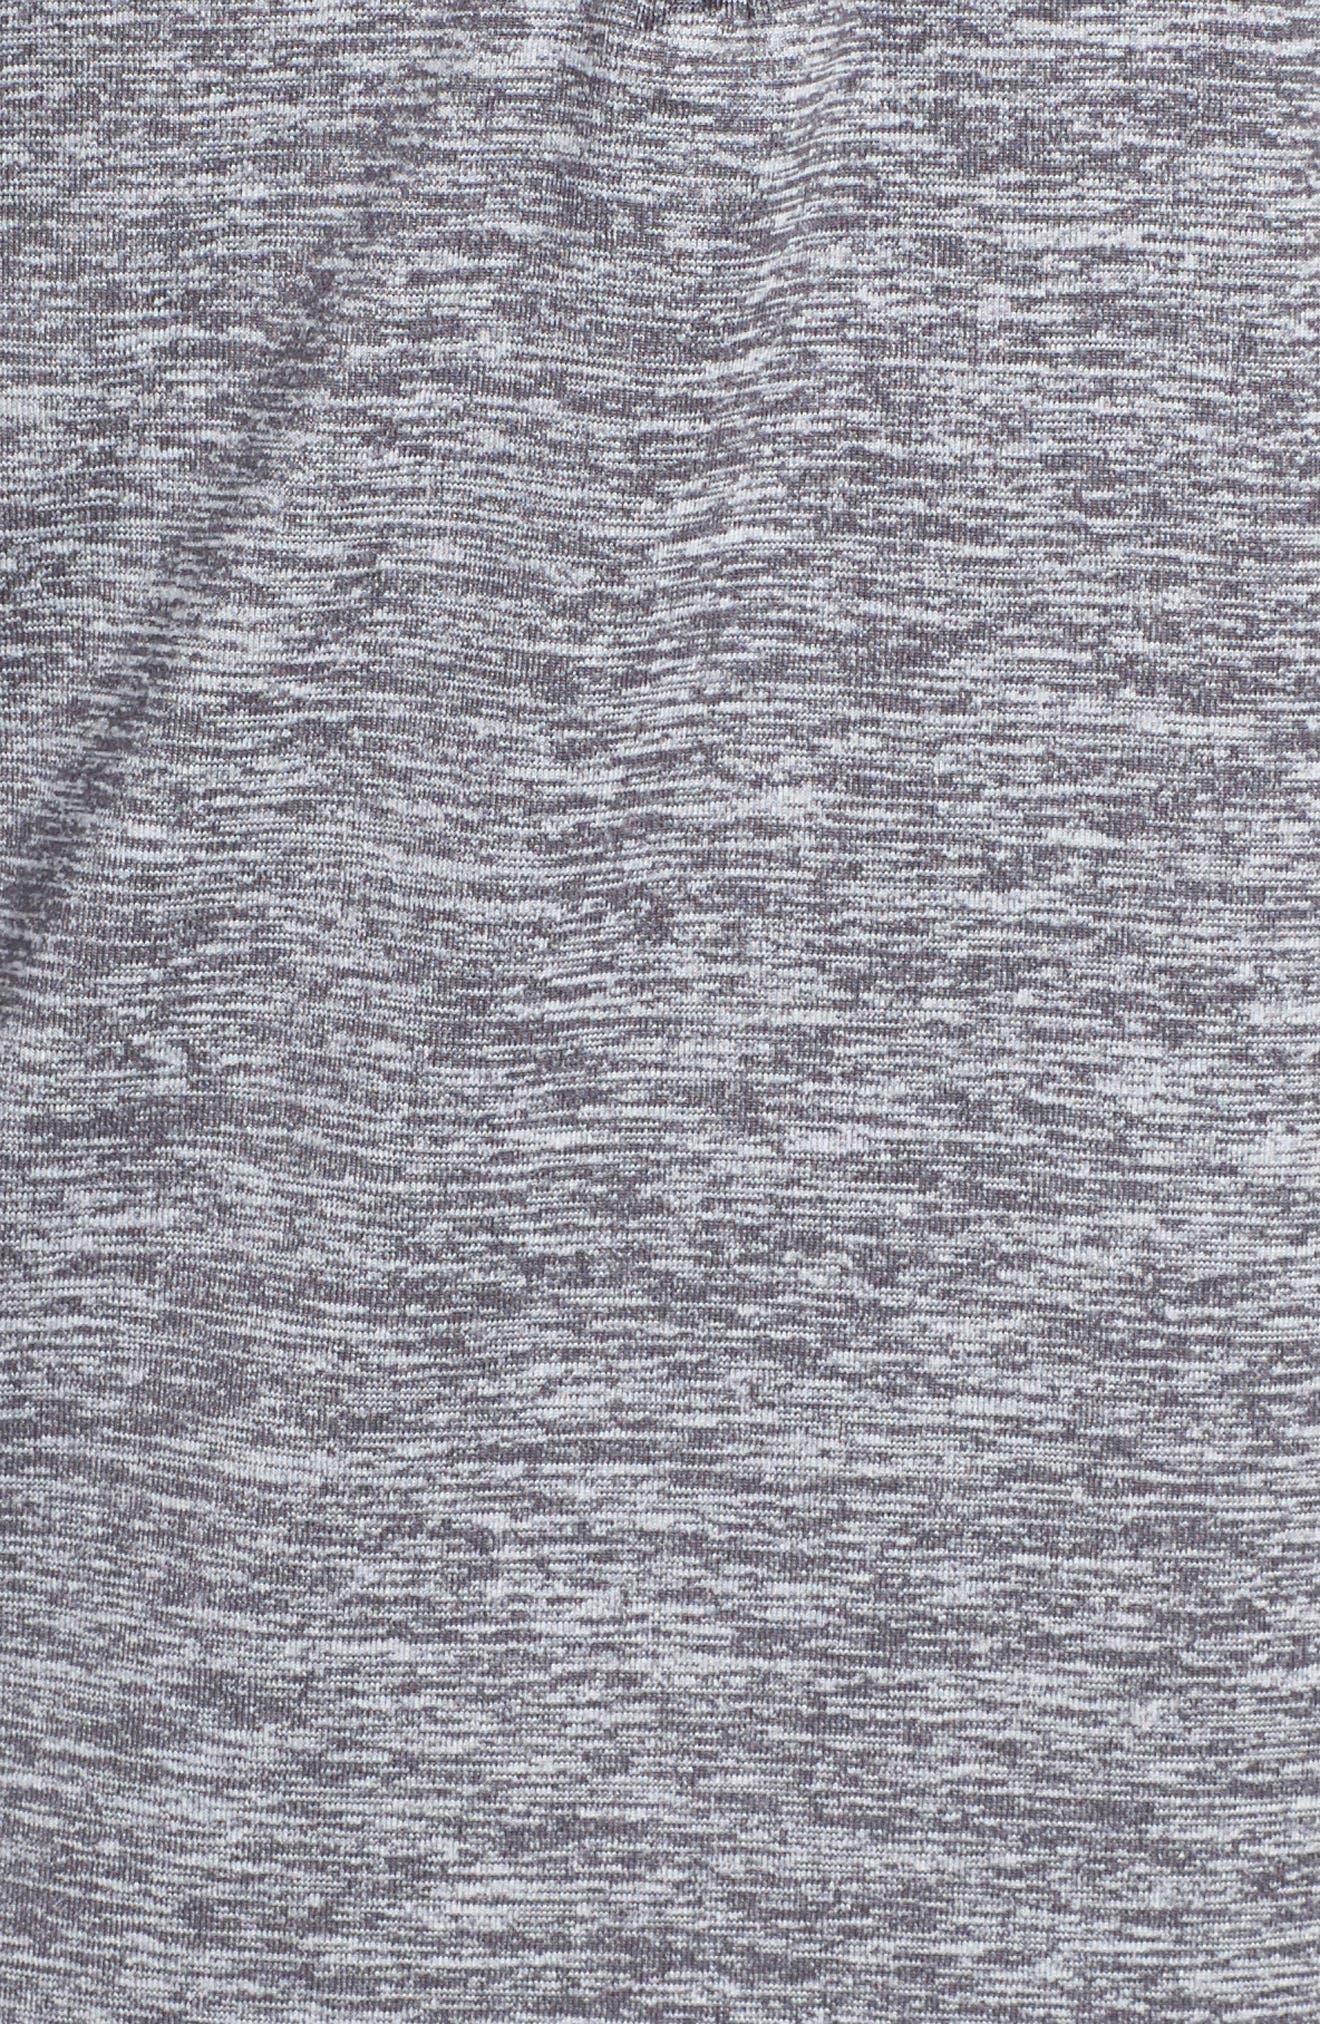 Dry Element Half Zip Top,                             Alternate thumbnail 6, color,                             Dark Grey/ Heather